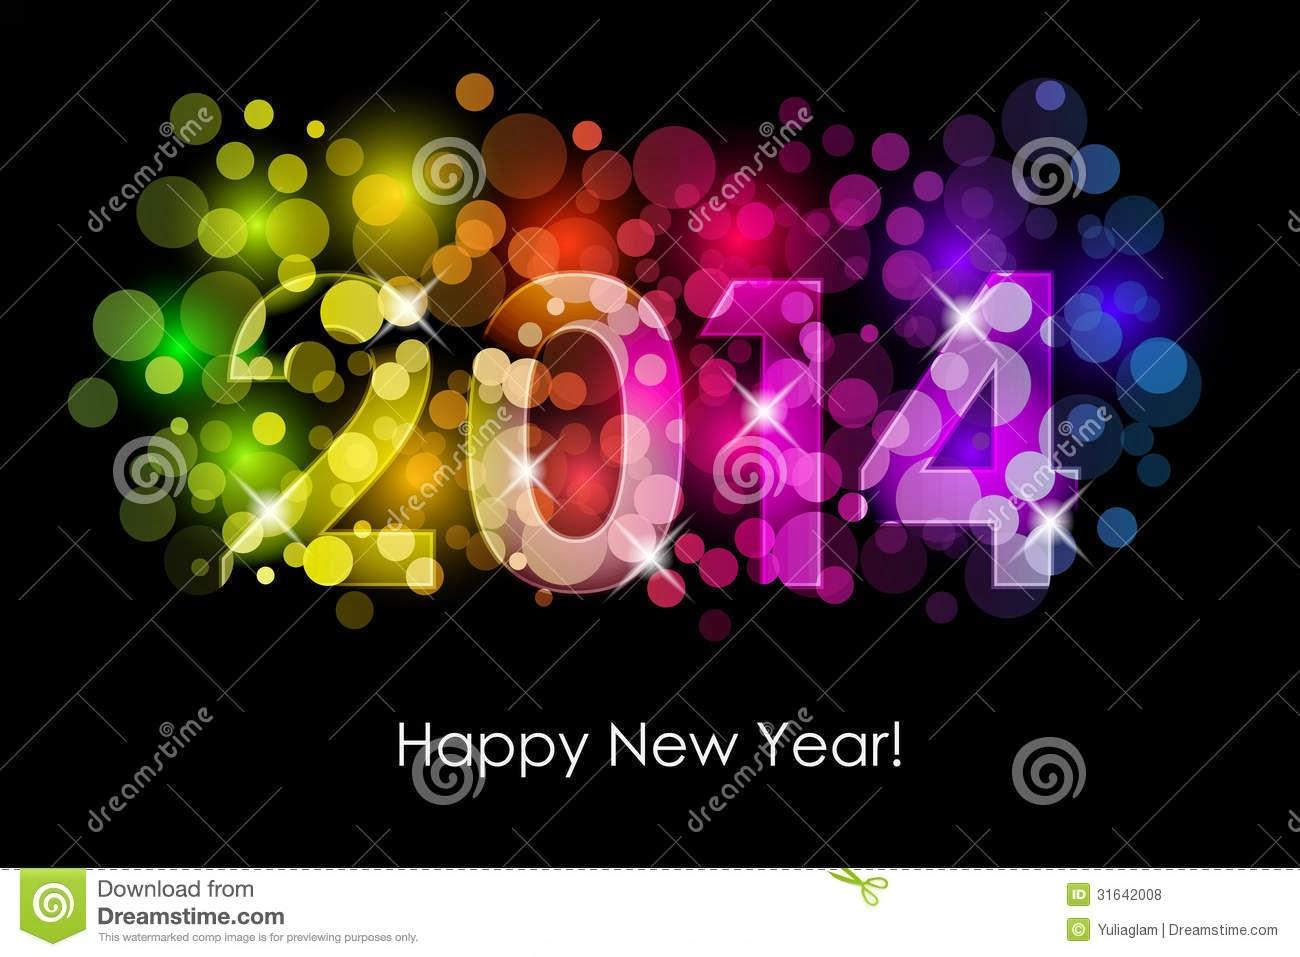 2014 Benefits Happy+new+year+wallpaper+2014+%28%296